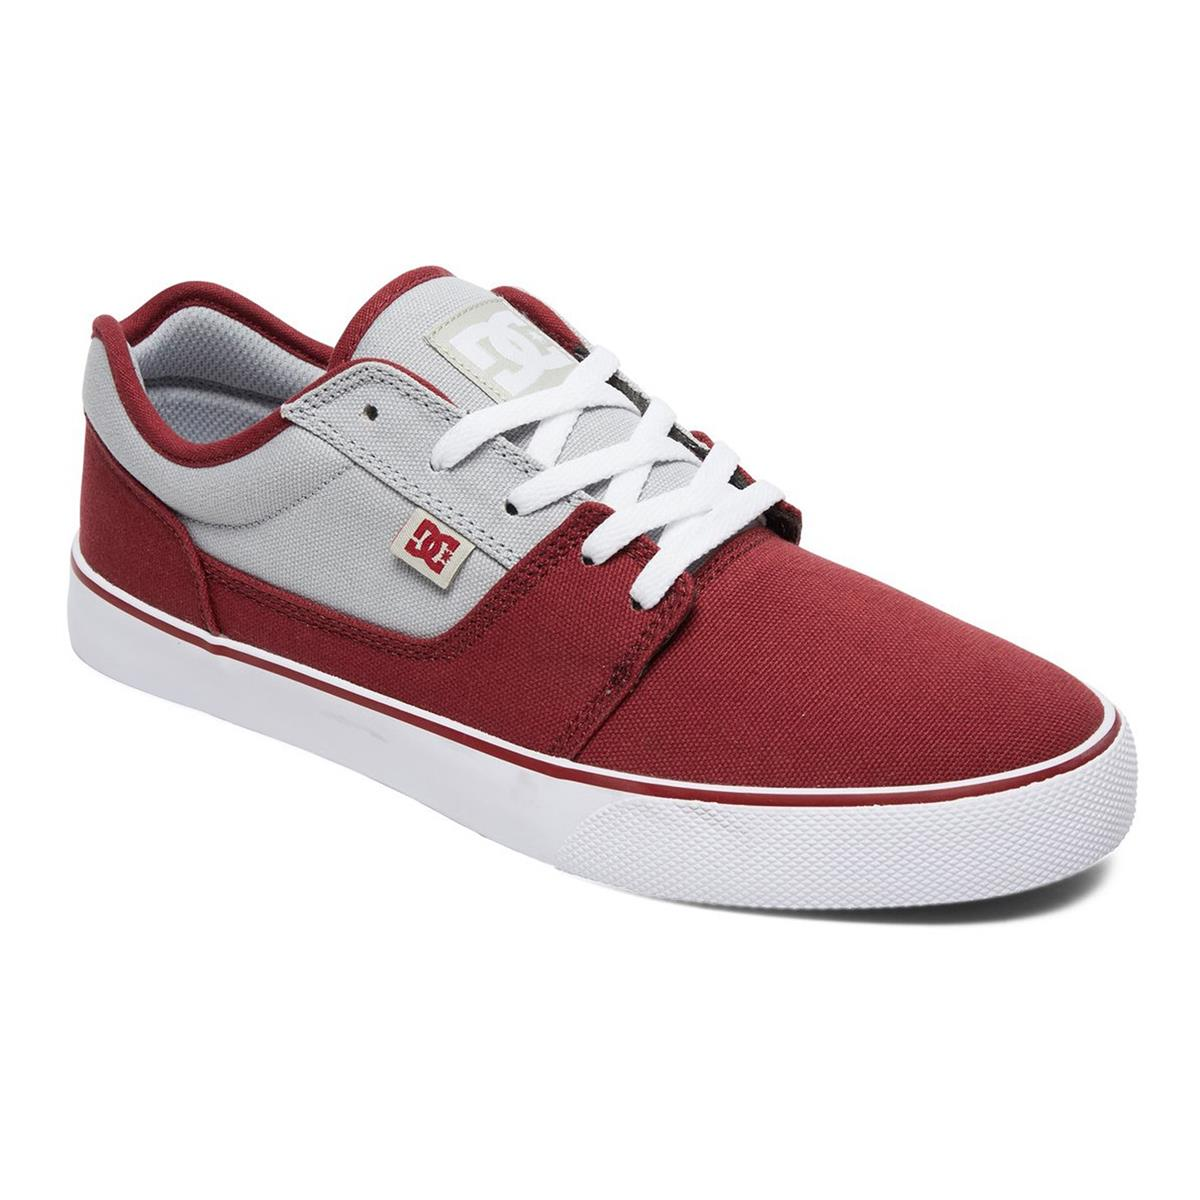 DC Schuhe Tonik TX Dunkelrot